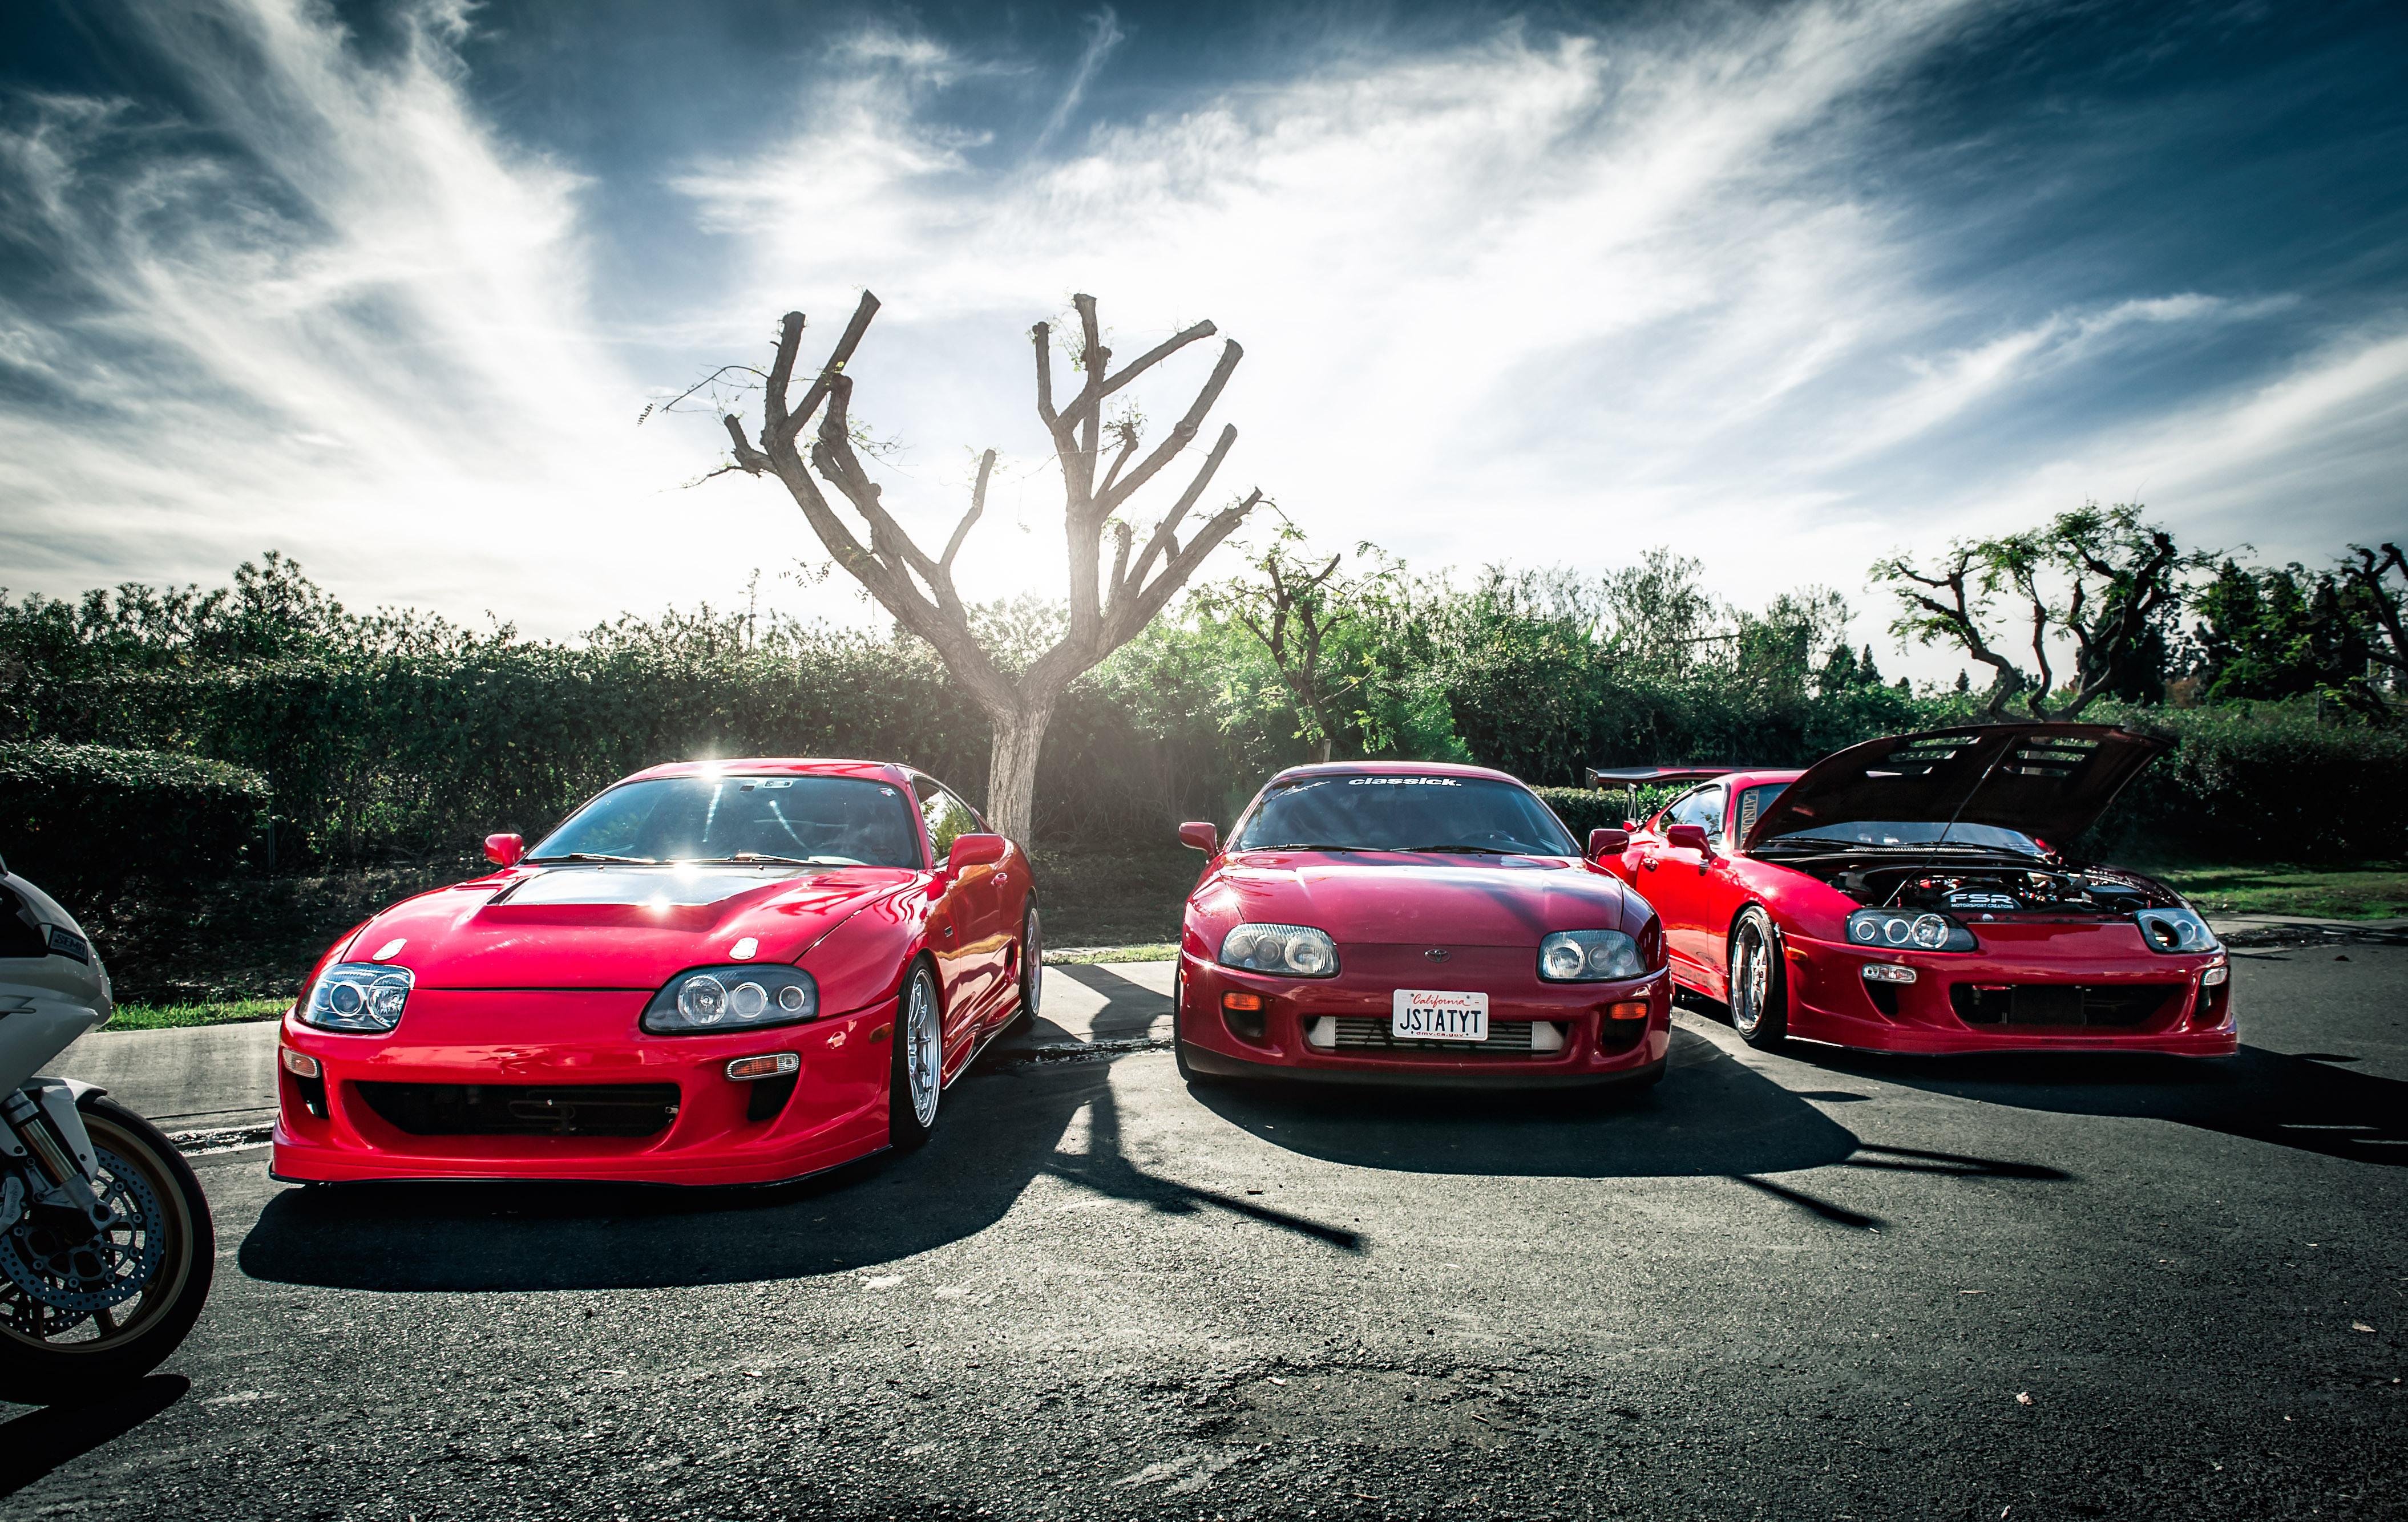 Imagenes De Autos Ultra Hd: Toyota Supra Wallpapers, Pictures, Images